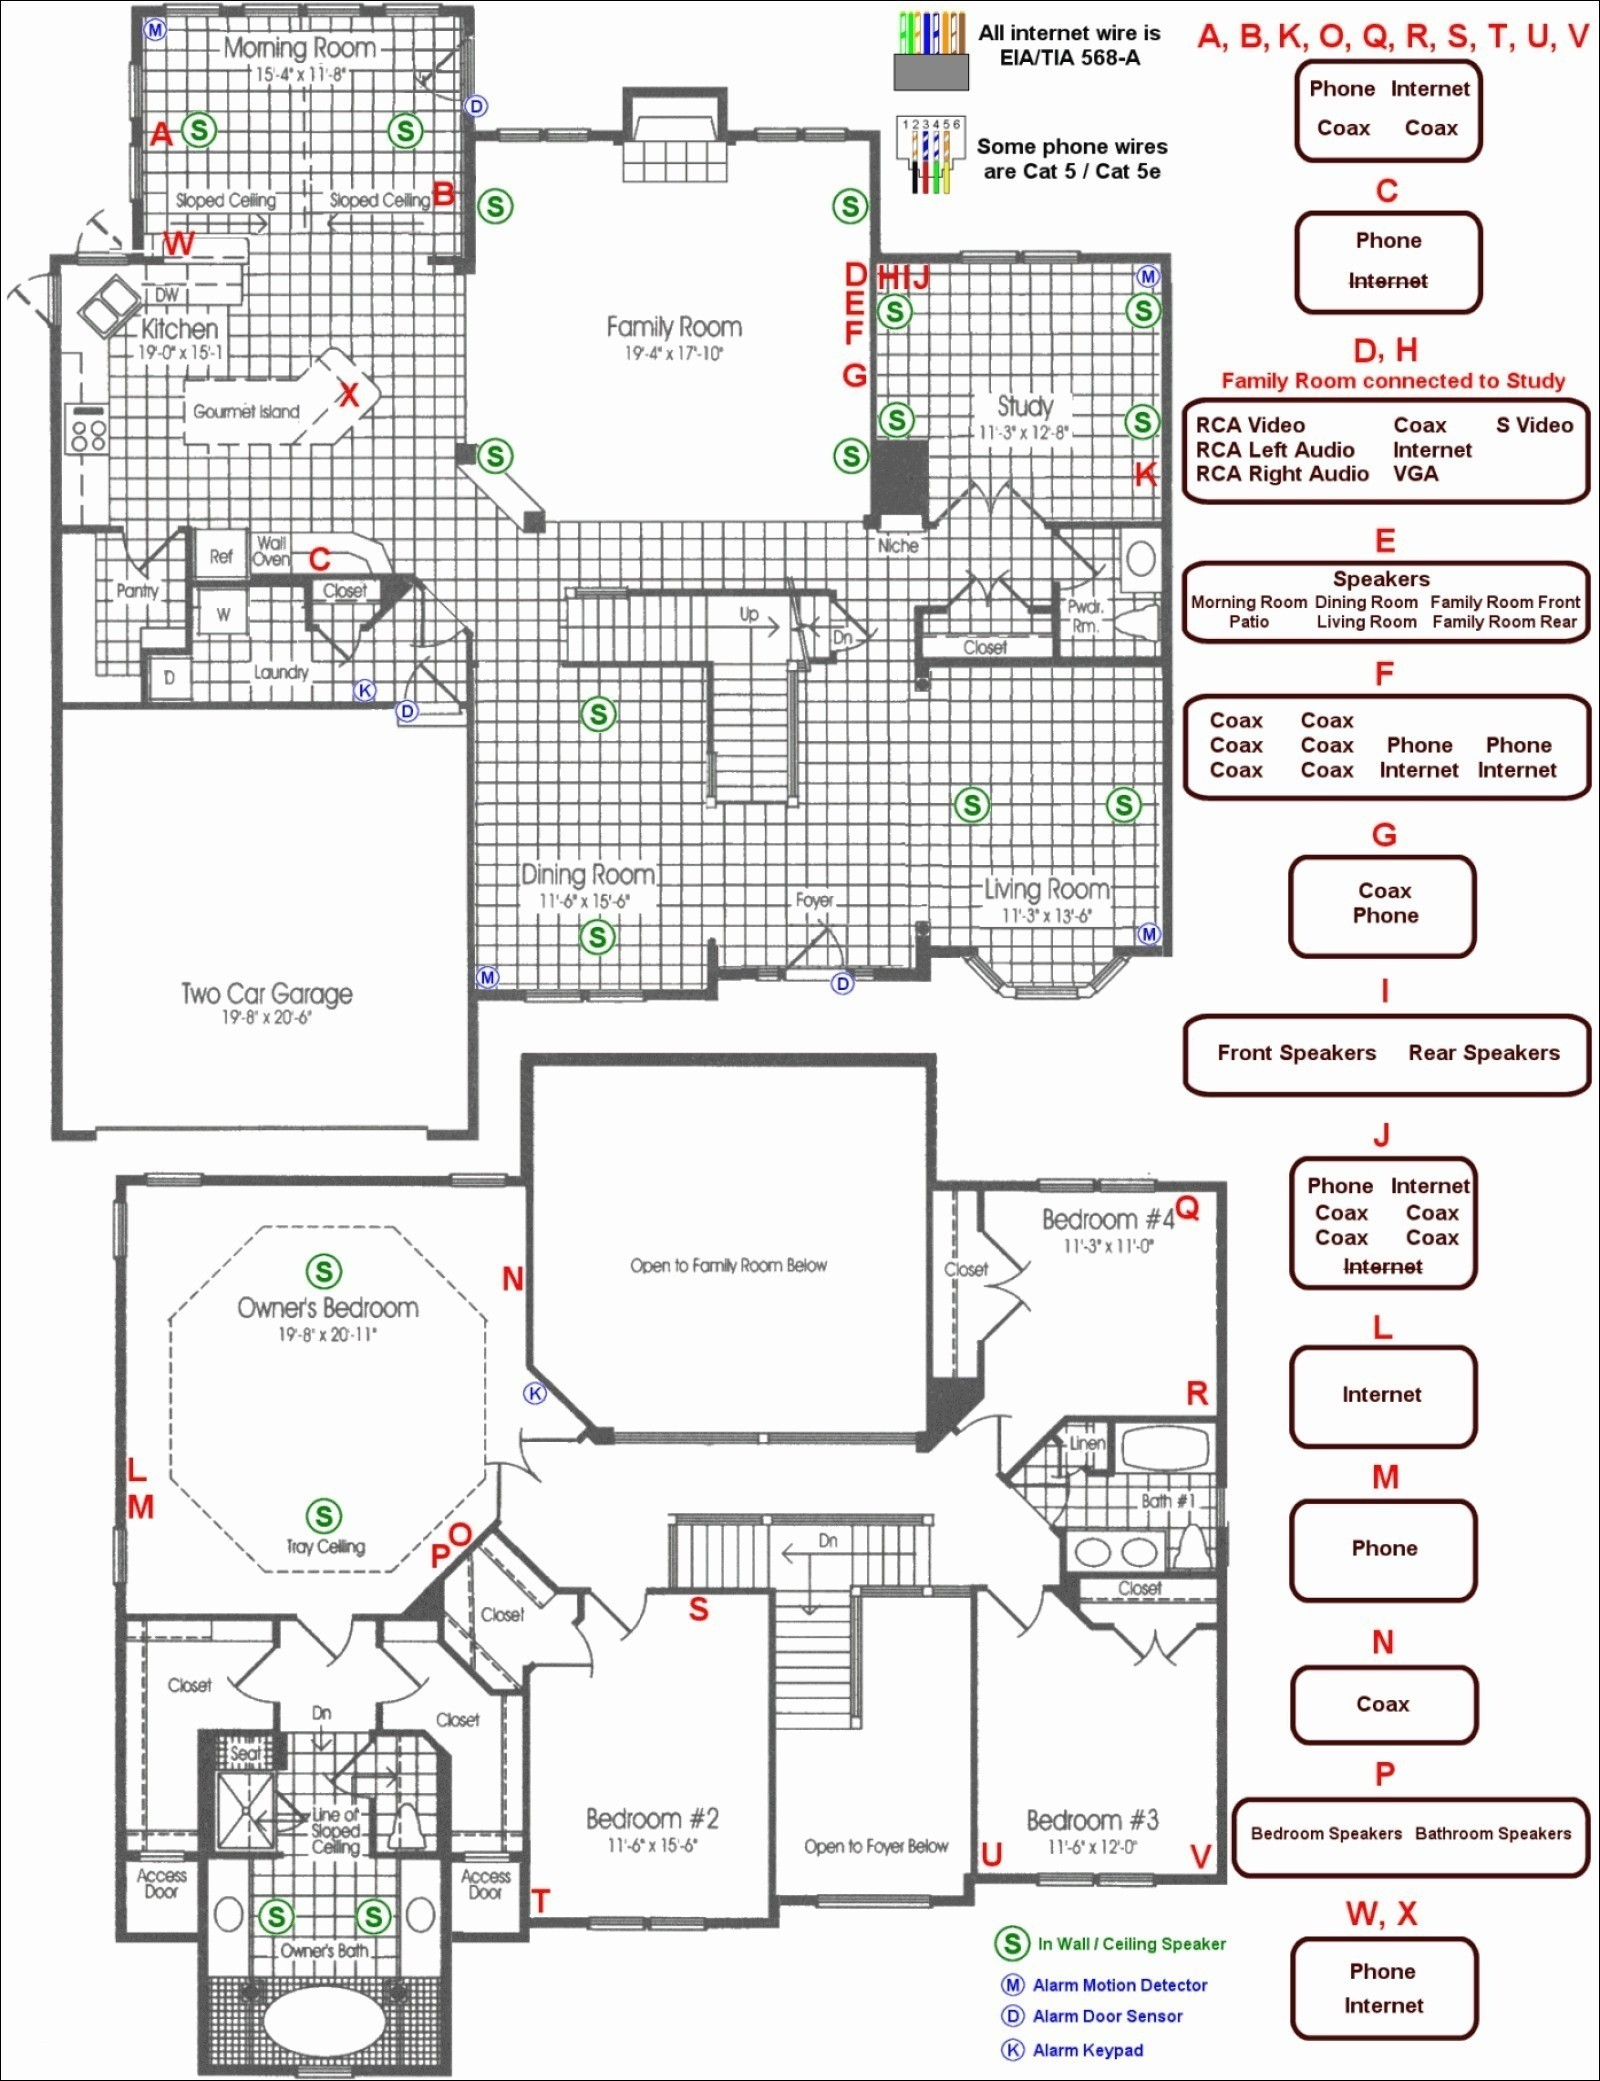 electrical wiring diagram House Wiring Diagram New Electrical Wiring Diagram software New